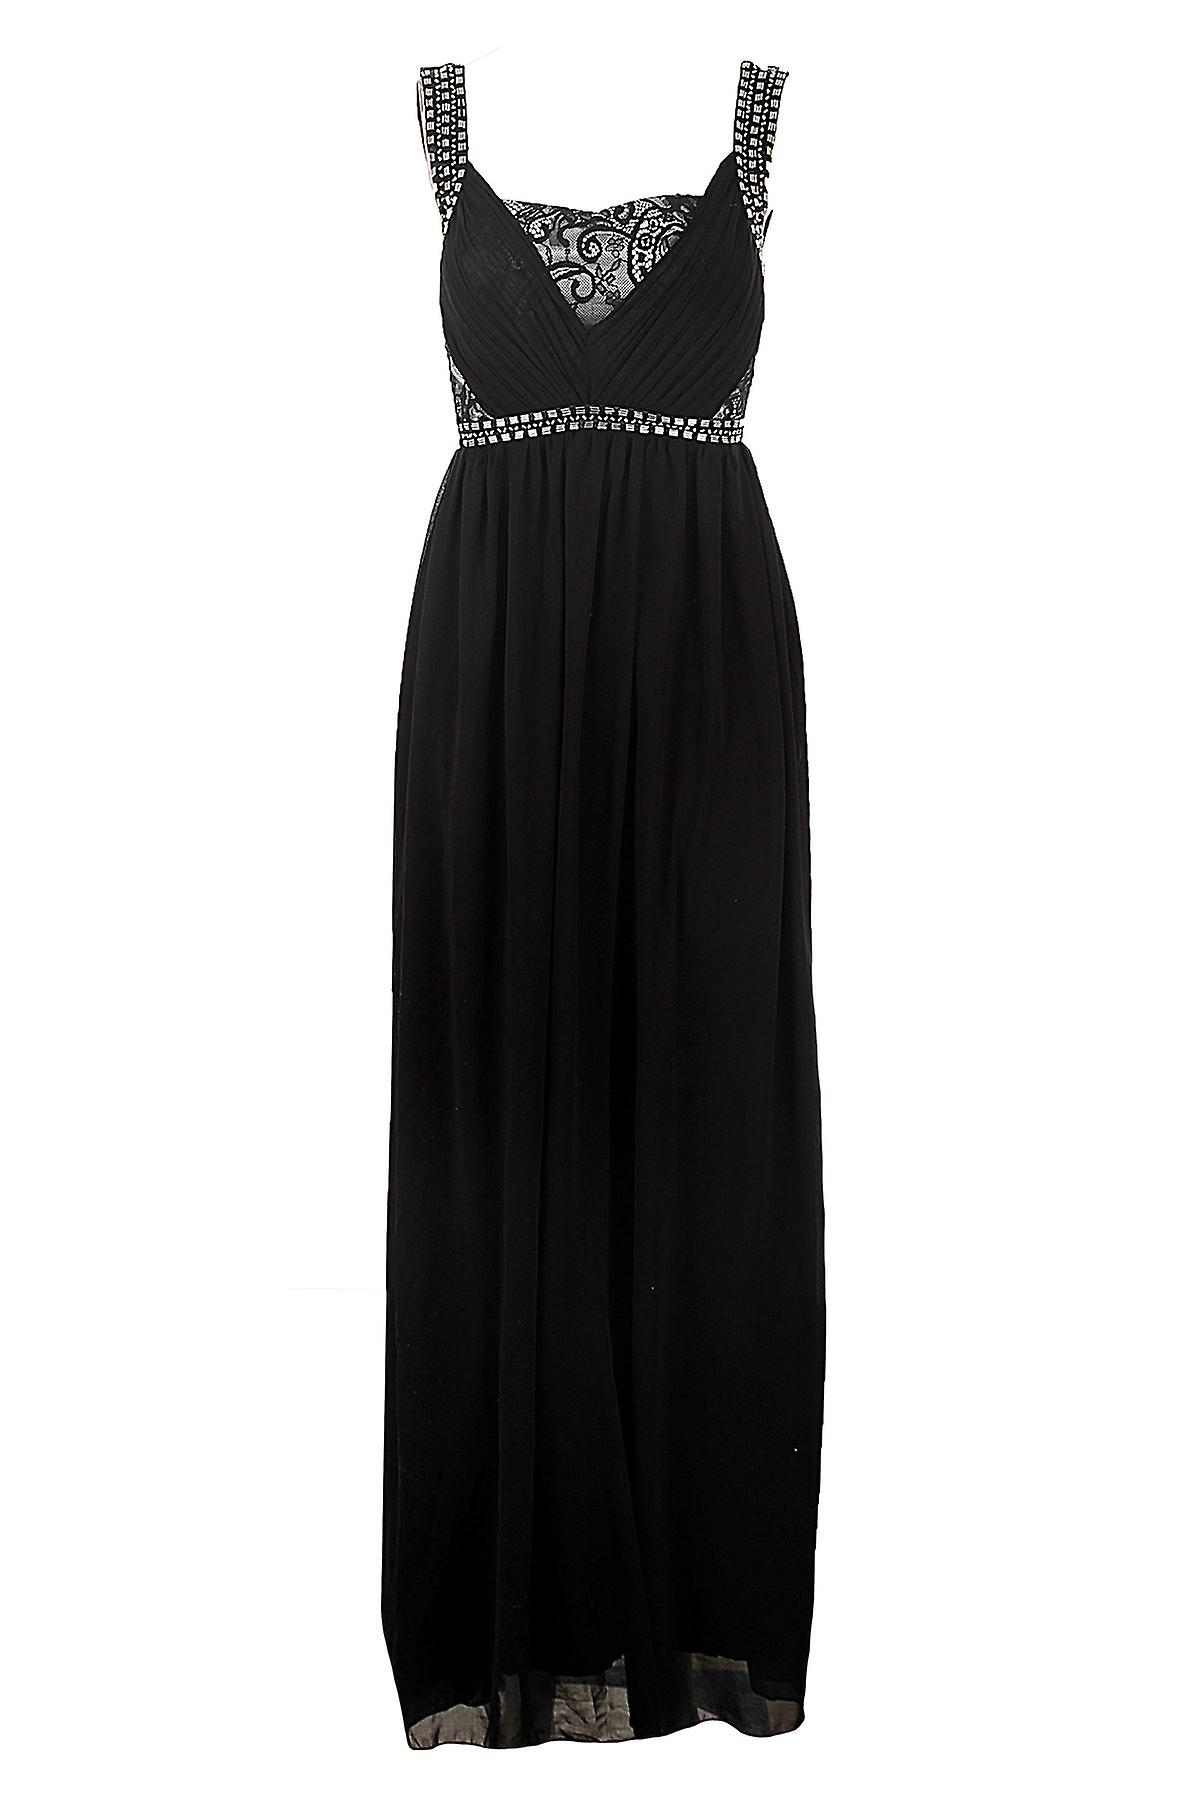 Ladies Diamante Strap Pleated Padded Lace Chiffon Long Maxi Women's Dress